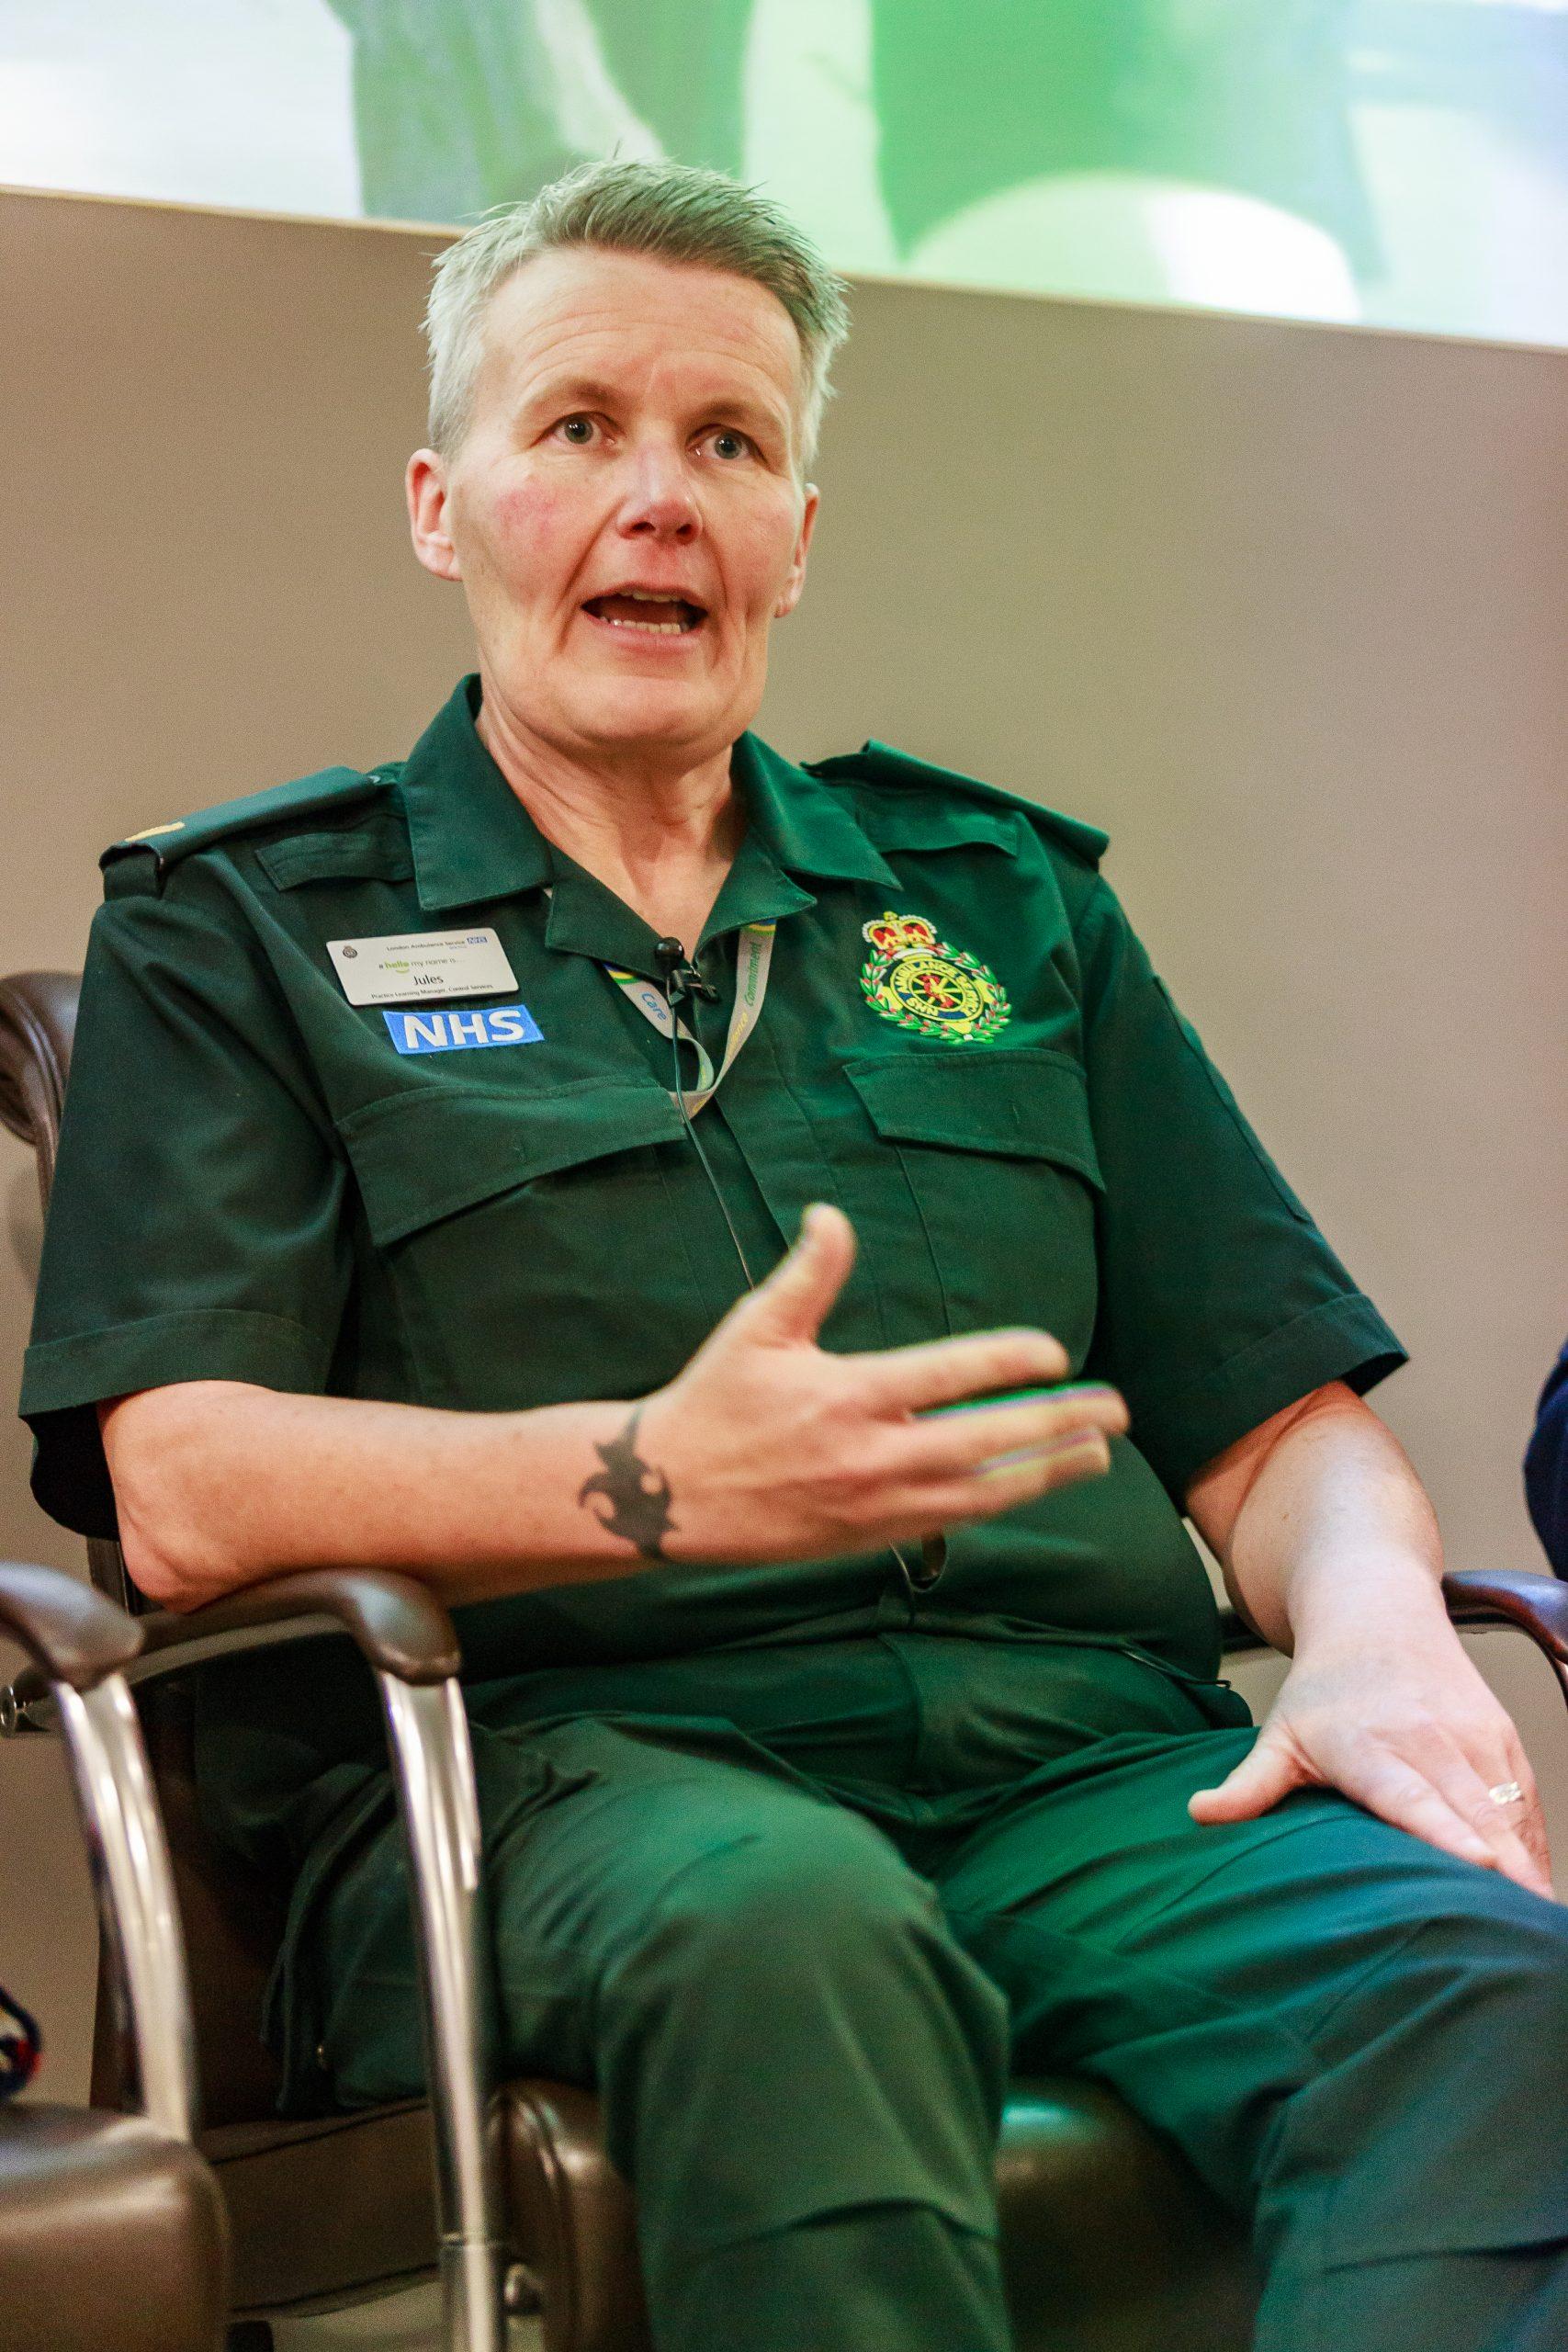 Jules Lockett from London Ambulance